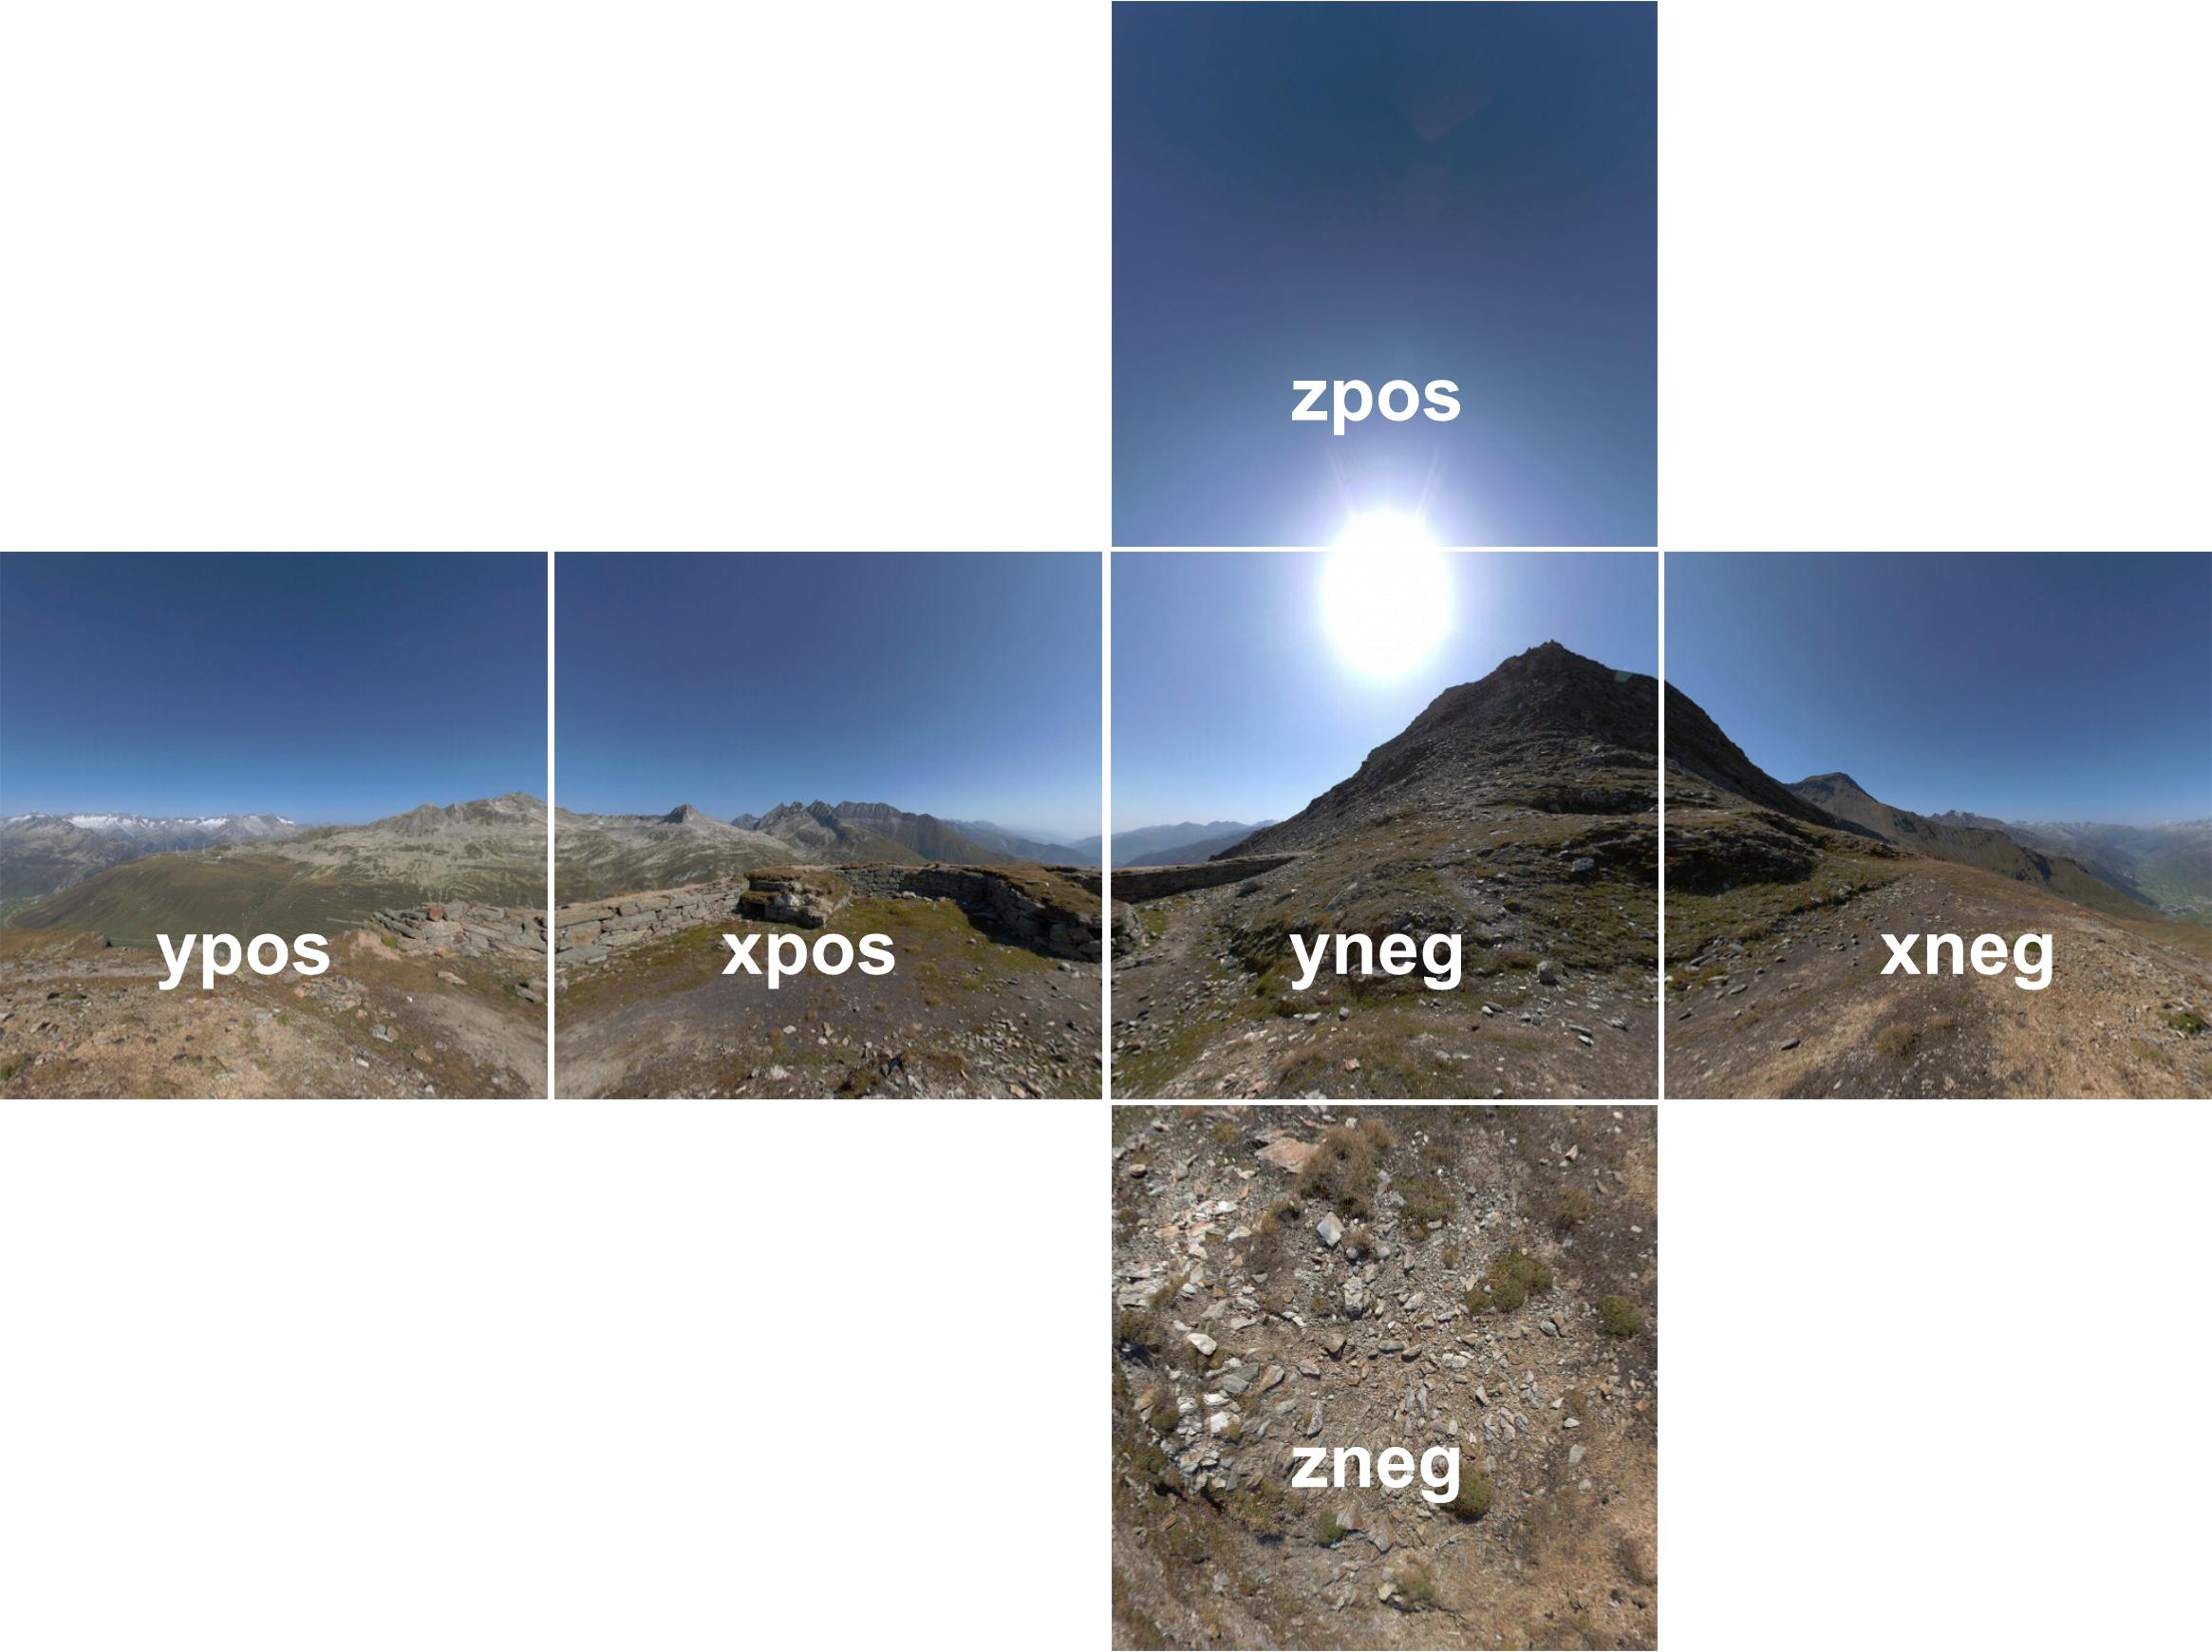 Skybox setup with positions zneg zpos yneg ypos xneg xpos